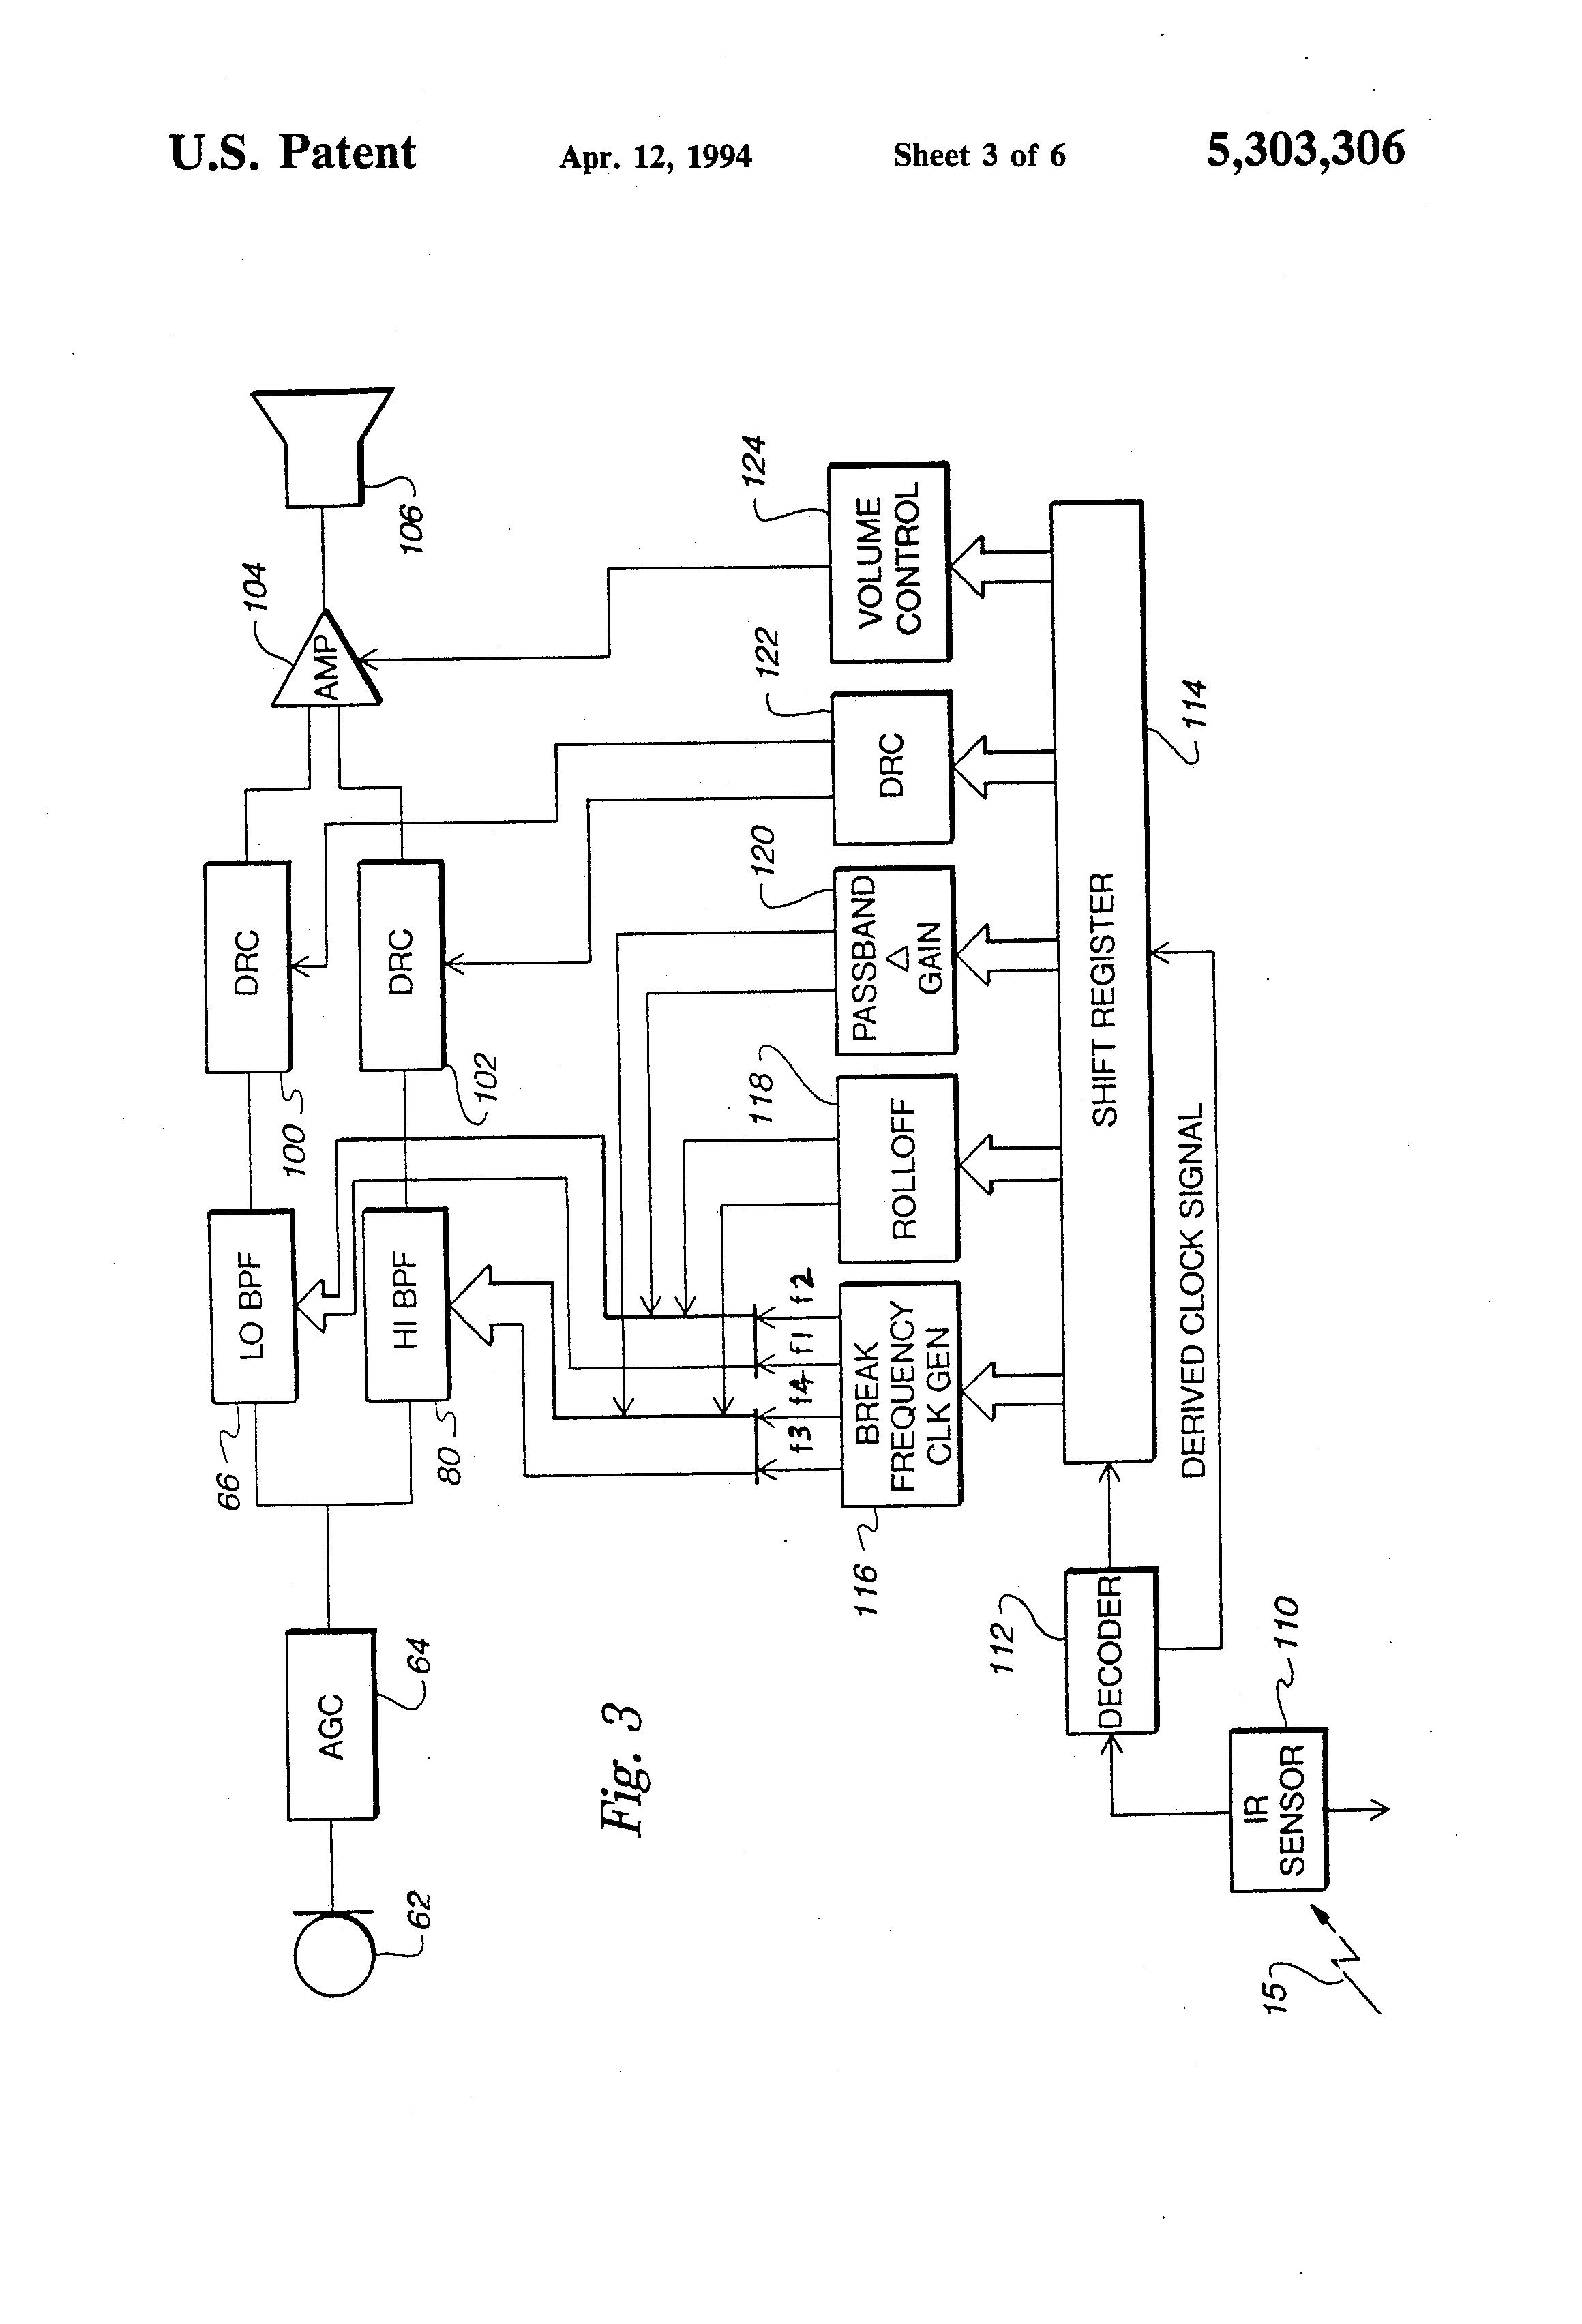 patente us5303306